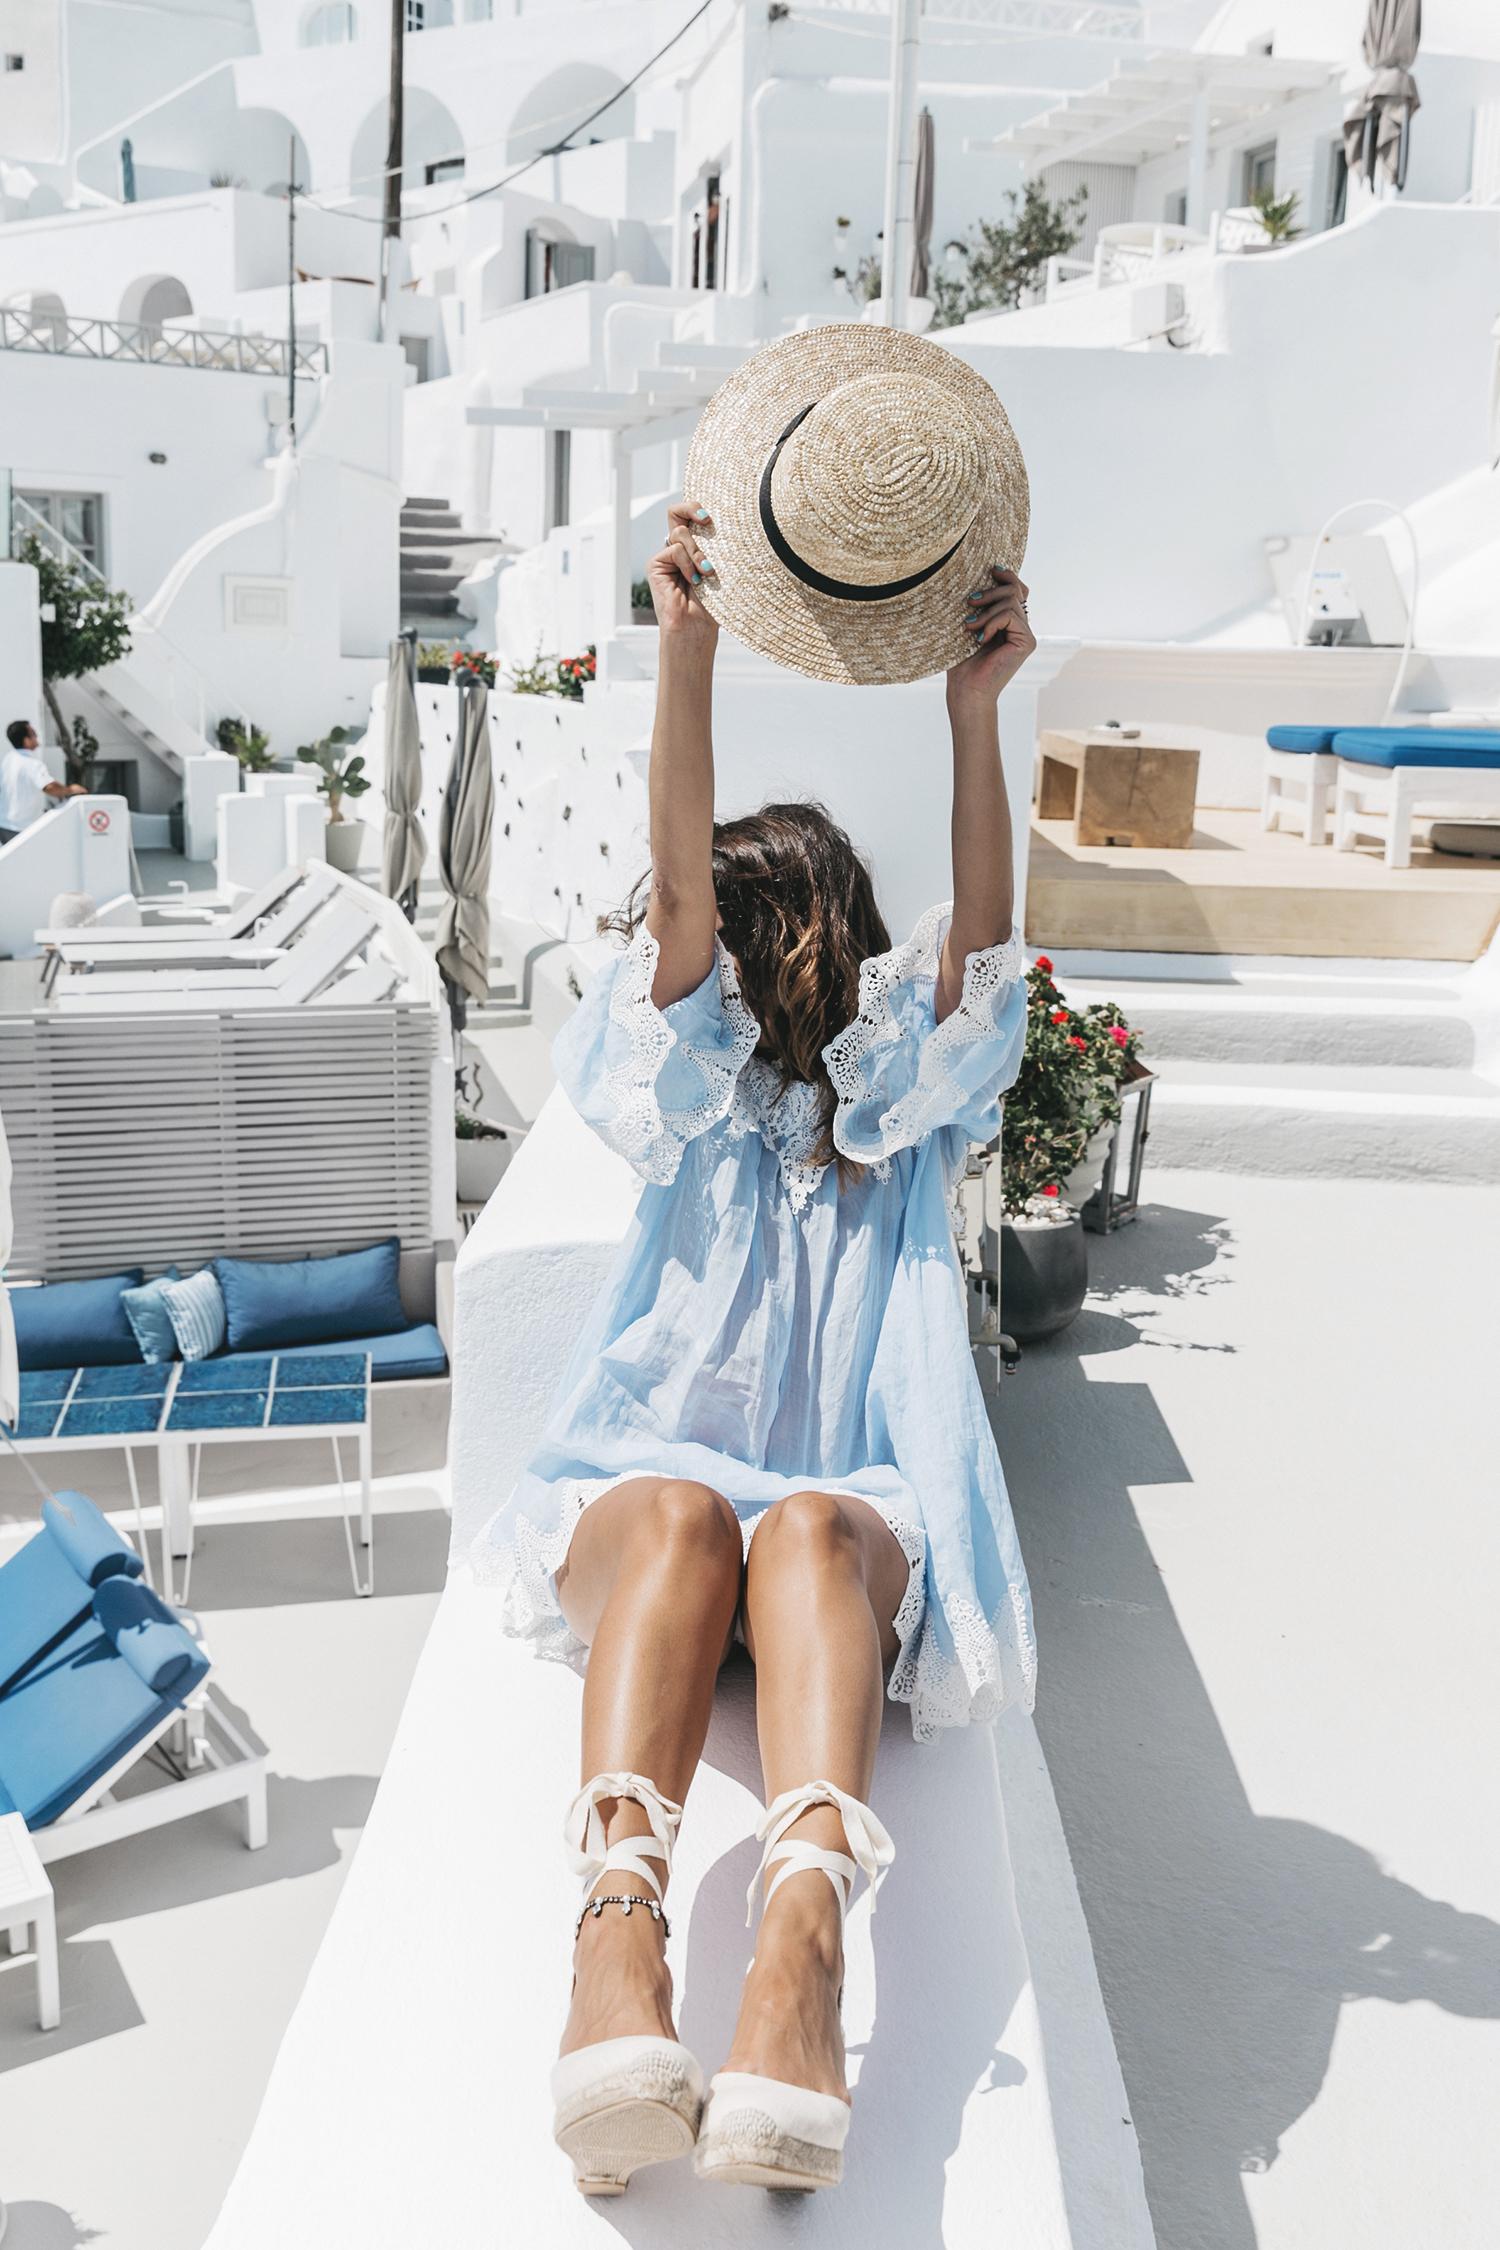 Blue_Dress-Soludos_Escapes-Soludos_Espadrilles-Canotier-Hat-Lack_Of_Color-Summer-Santorini-Collage_Vintage-61